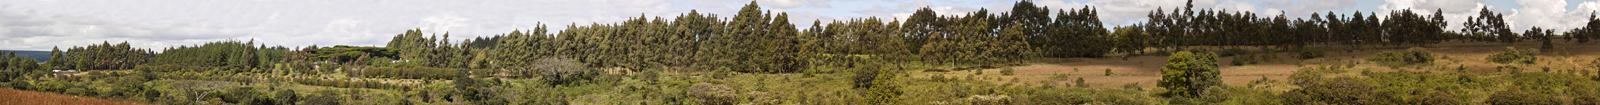 Kibidula Campus Panoramic Picture